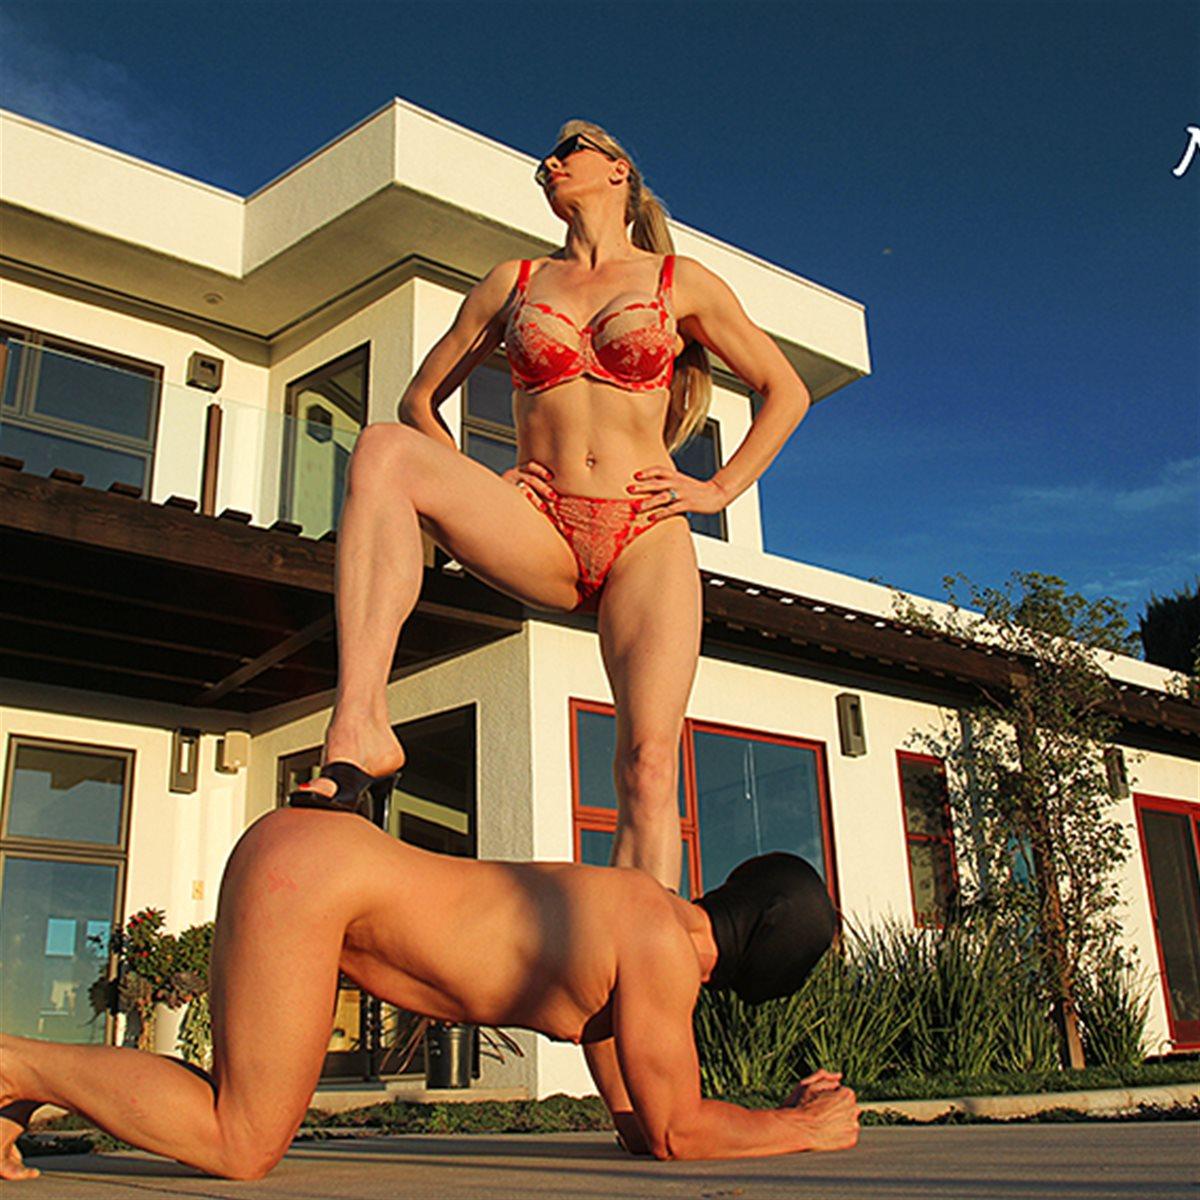 Goddess Severa - Sexy Mistress: http://www.kinkymistresses.com/Goddess-Severa-Sexy-Mistress-636250082214042502-blog.htm